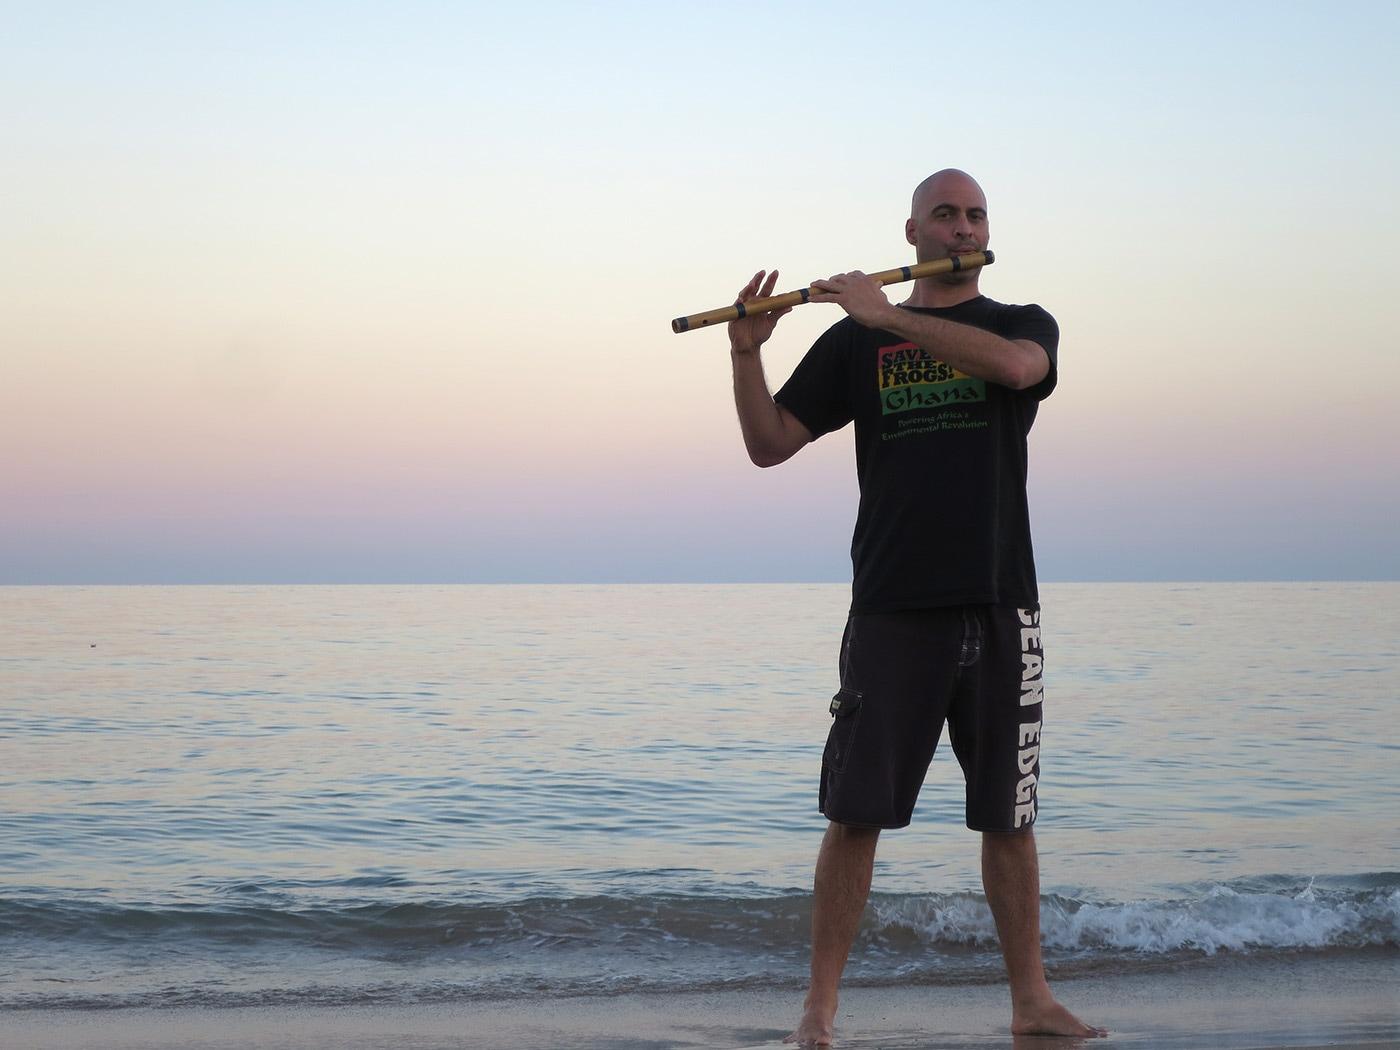 UAE - Kerry Kriger Indian Flute - Fujairah Beach